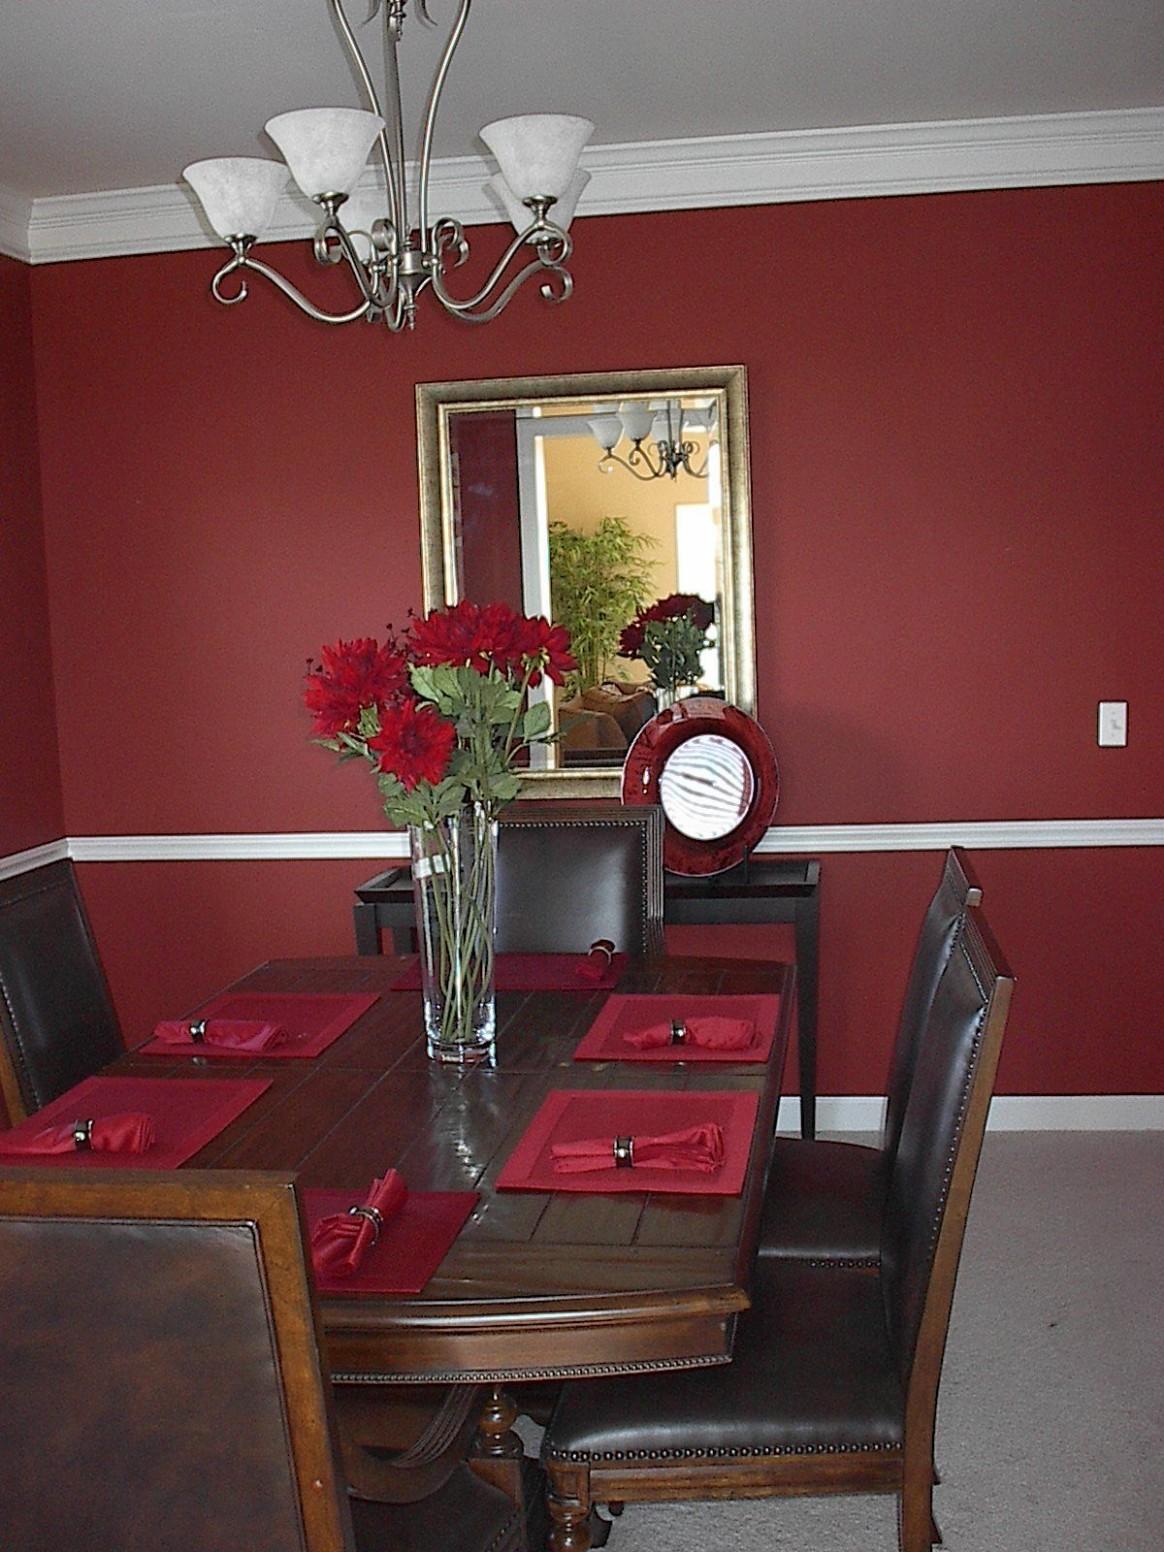 dining room decorating ideas  Dining room colors, Dining room  - Dining Room Ideas Red